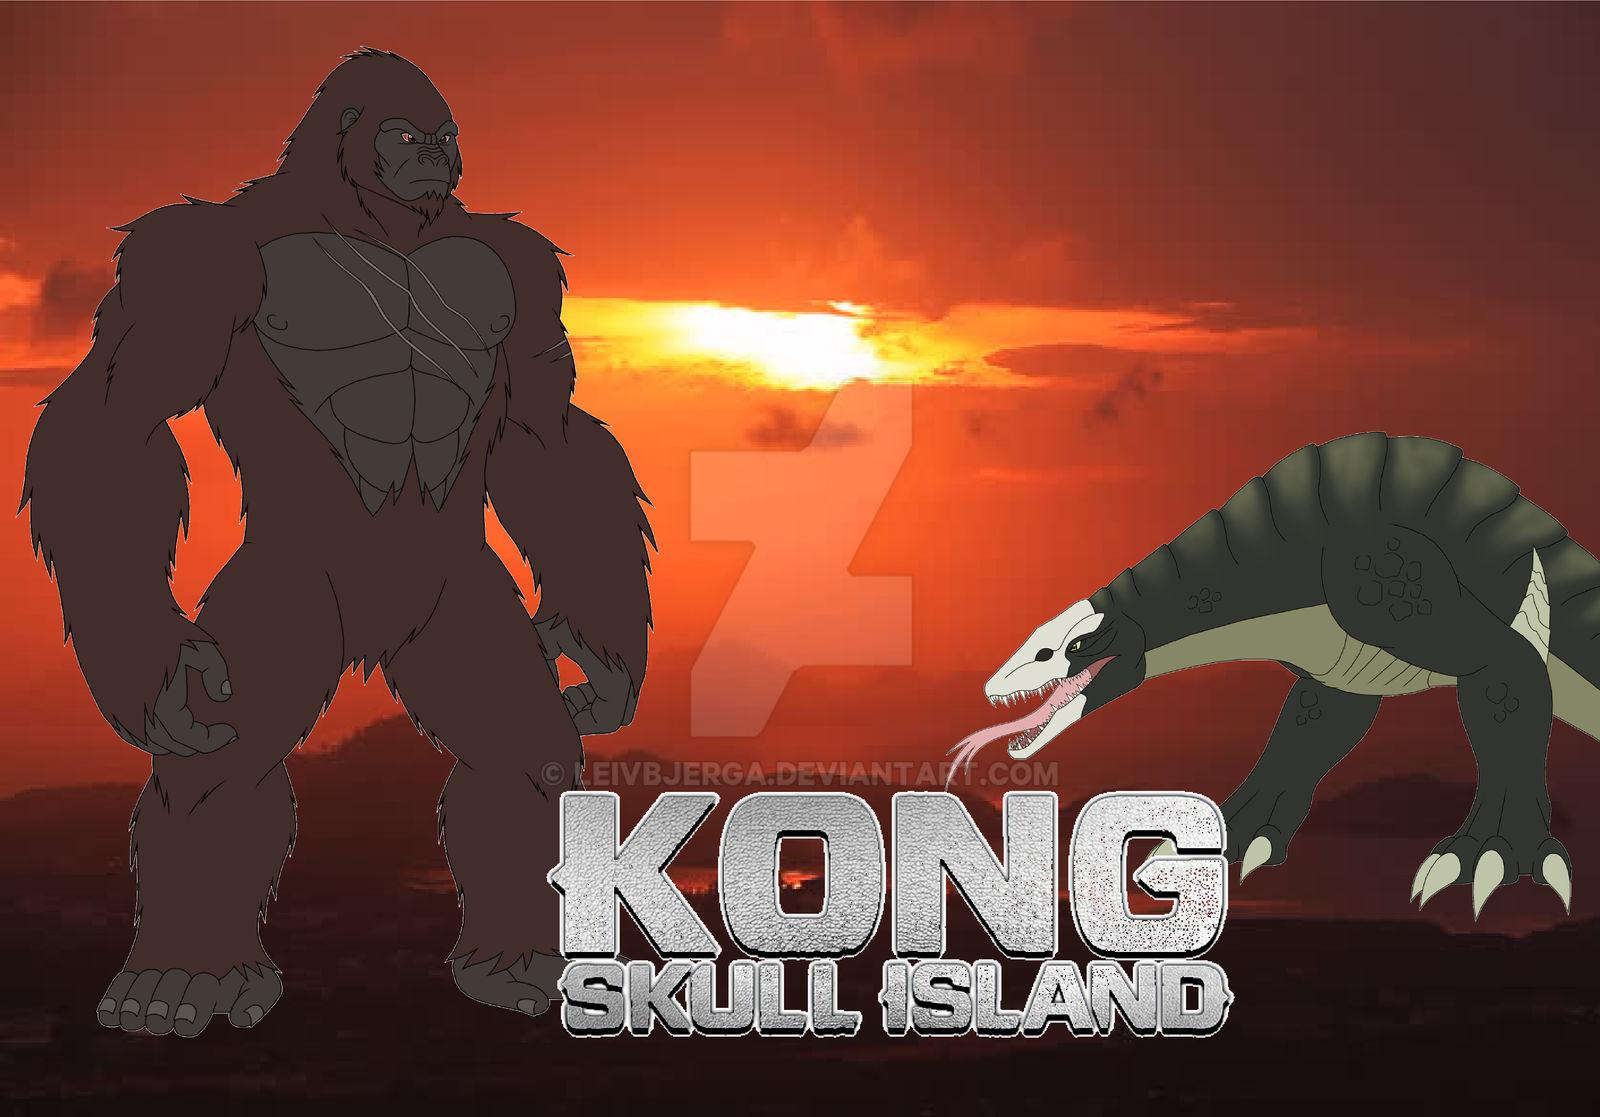 Kong Skull Island 2017 Poster By Leivbjerga On Deviantart